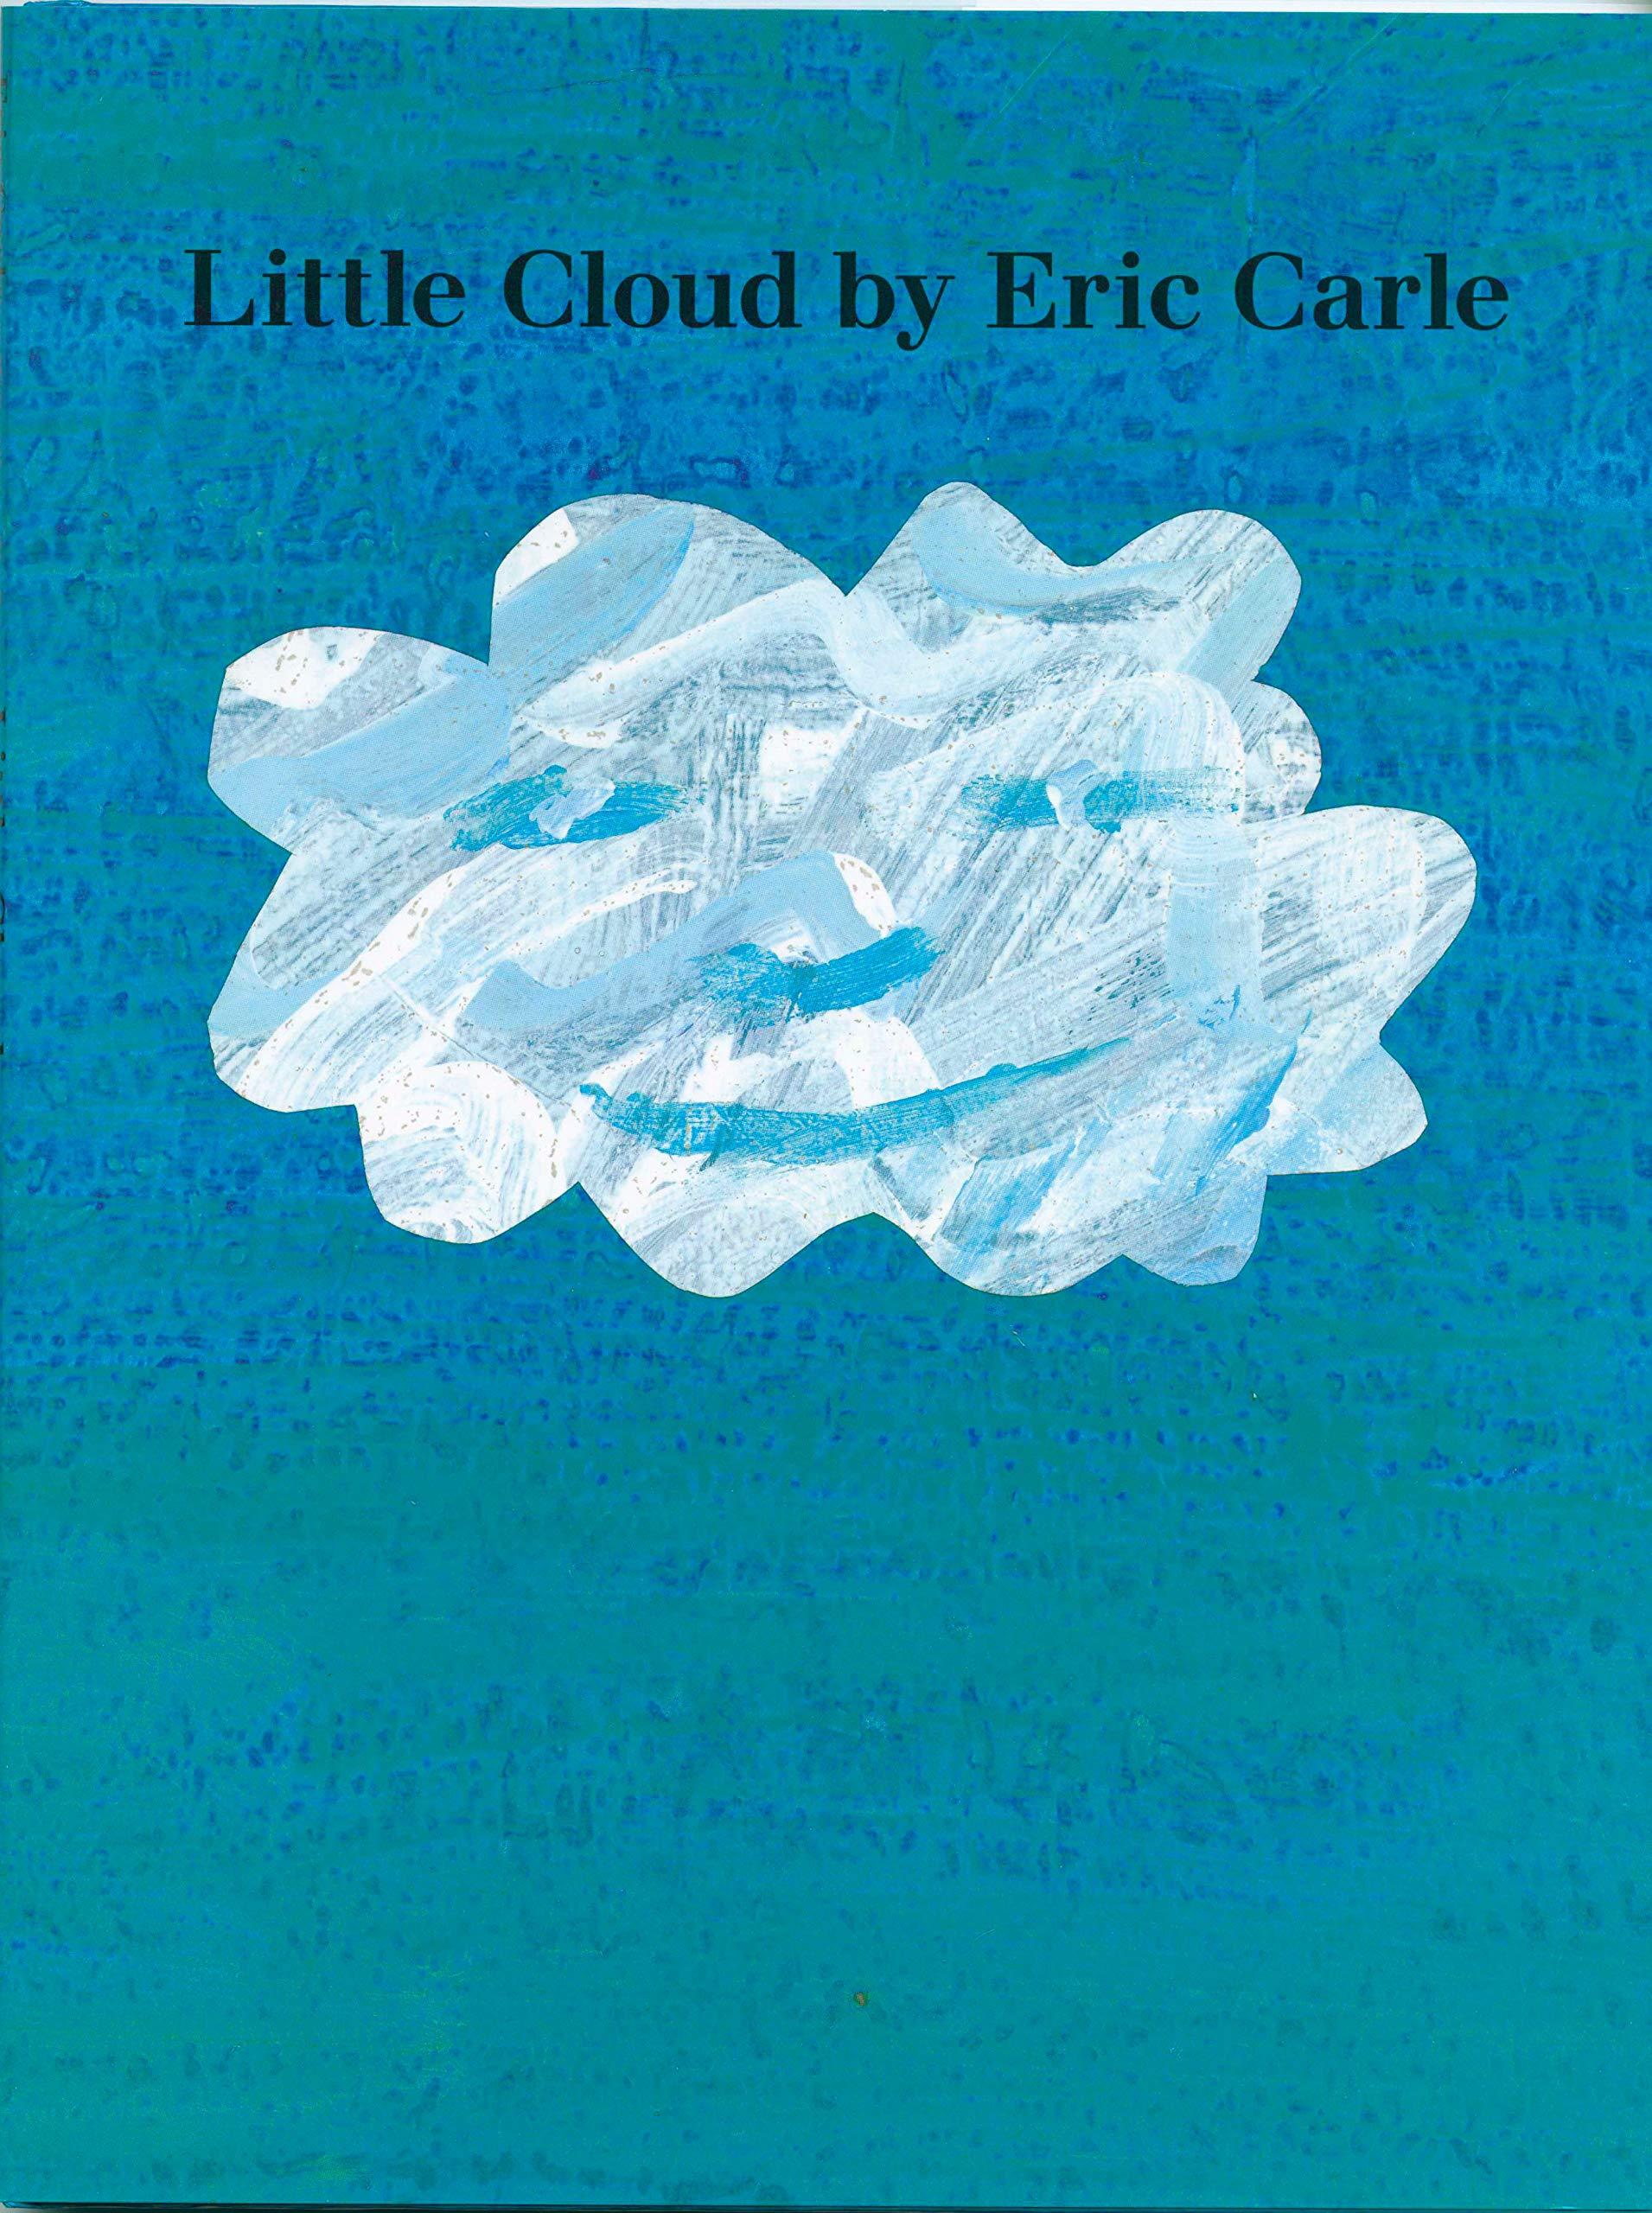 Little Cloud: Carle, Eric, Carle, Eric: 9780698118300: Books - Amazon.ca